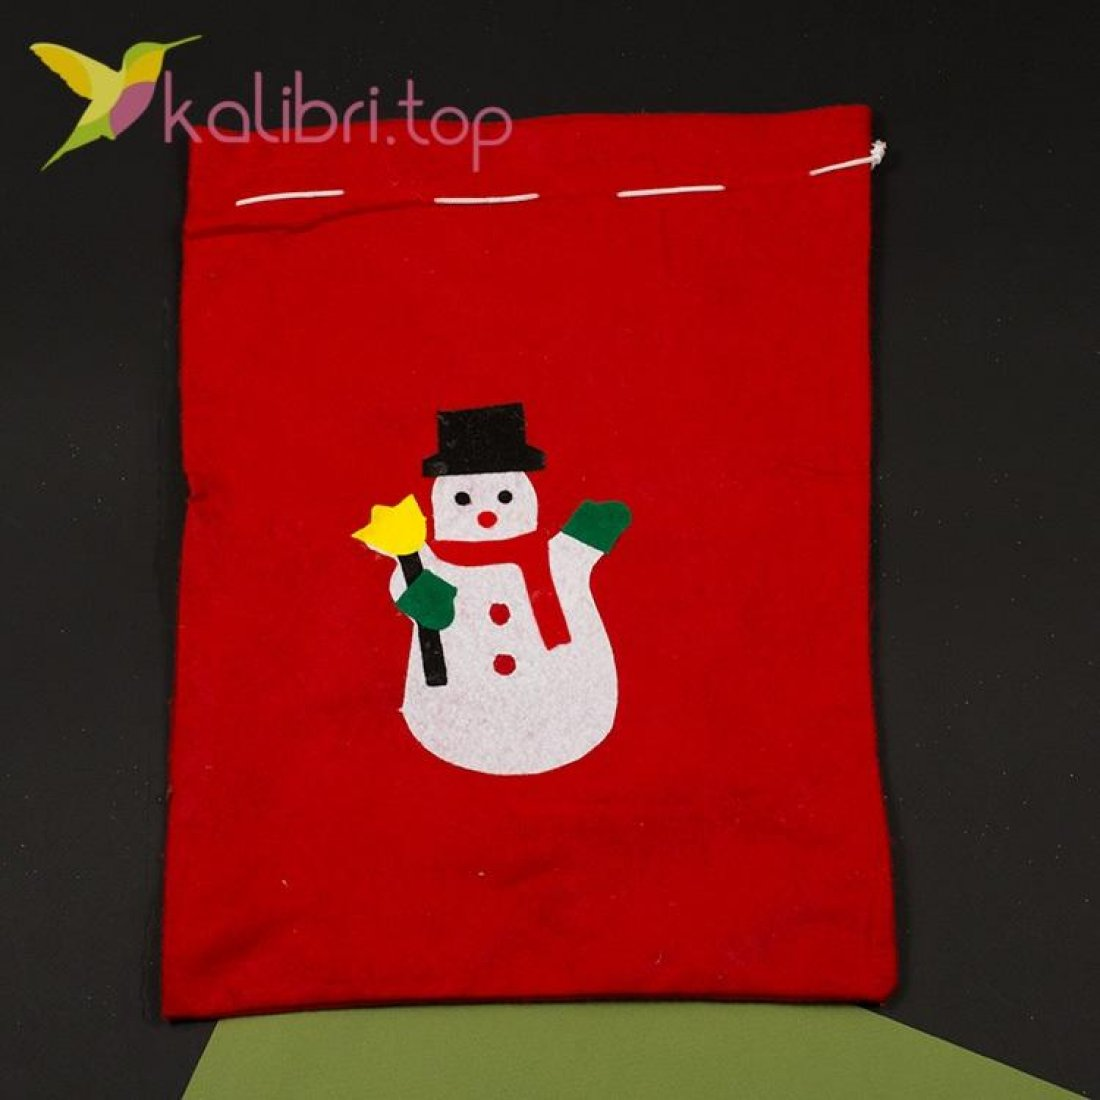 Мешок для подарков средний микс, оптом фото 3